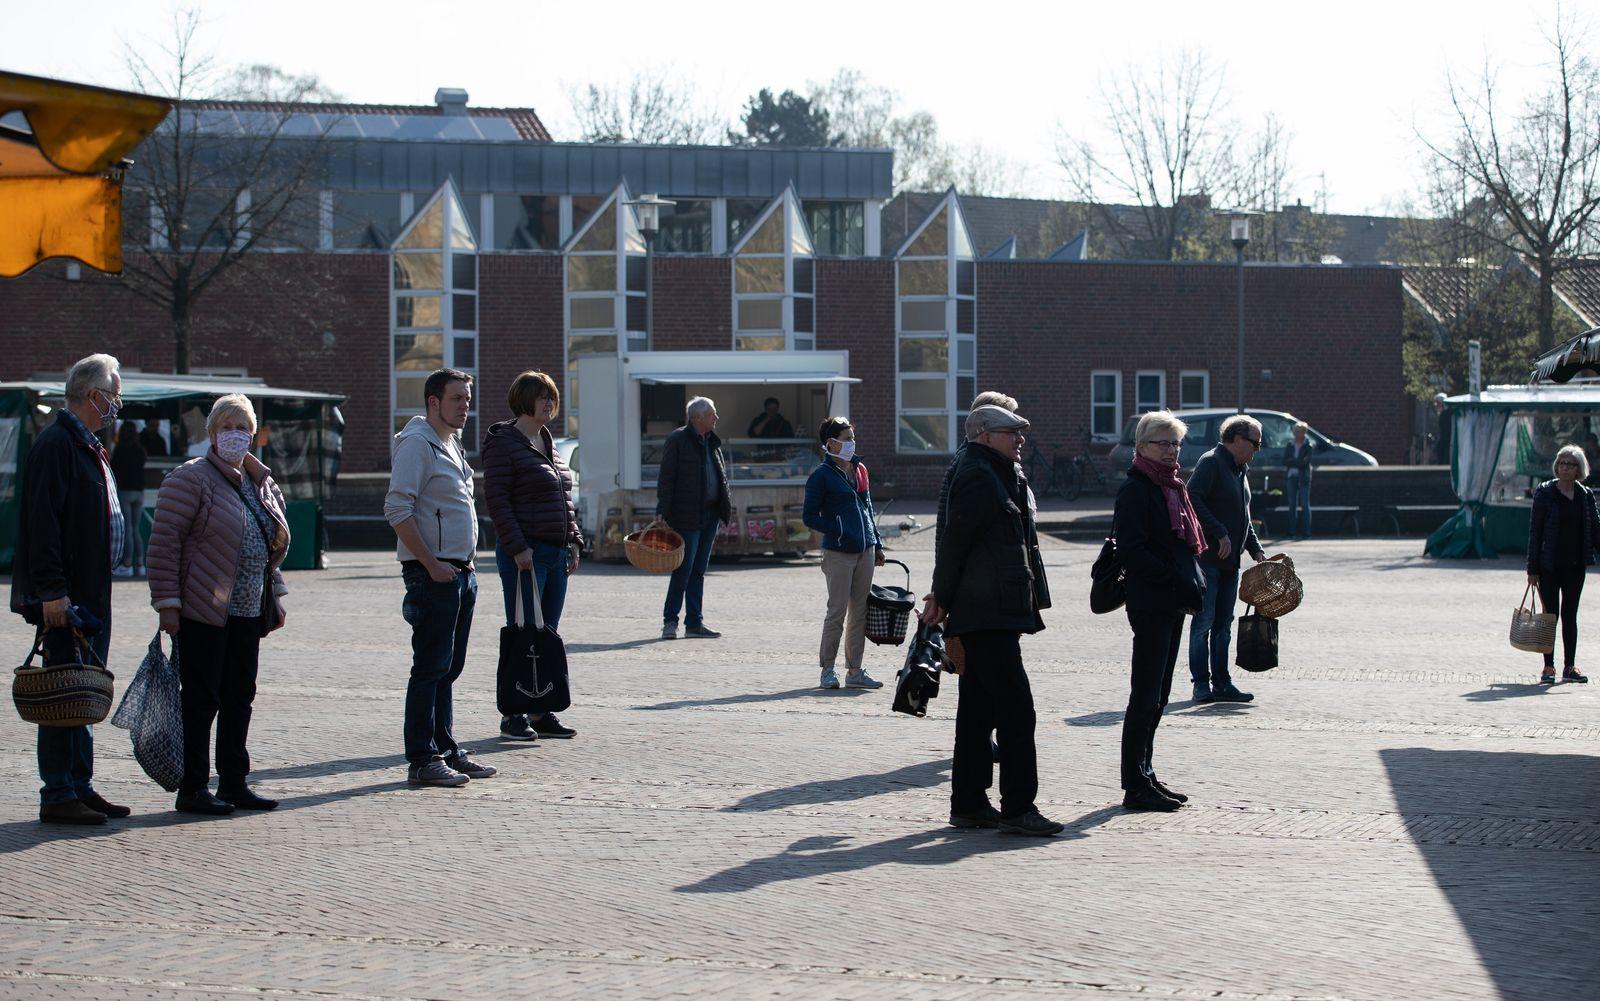 Coronavirus - Wochenmarkt Nordhorn